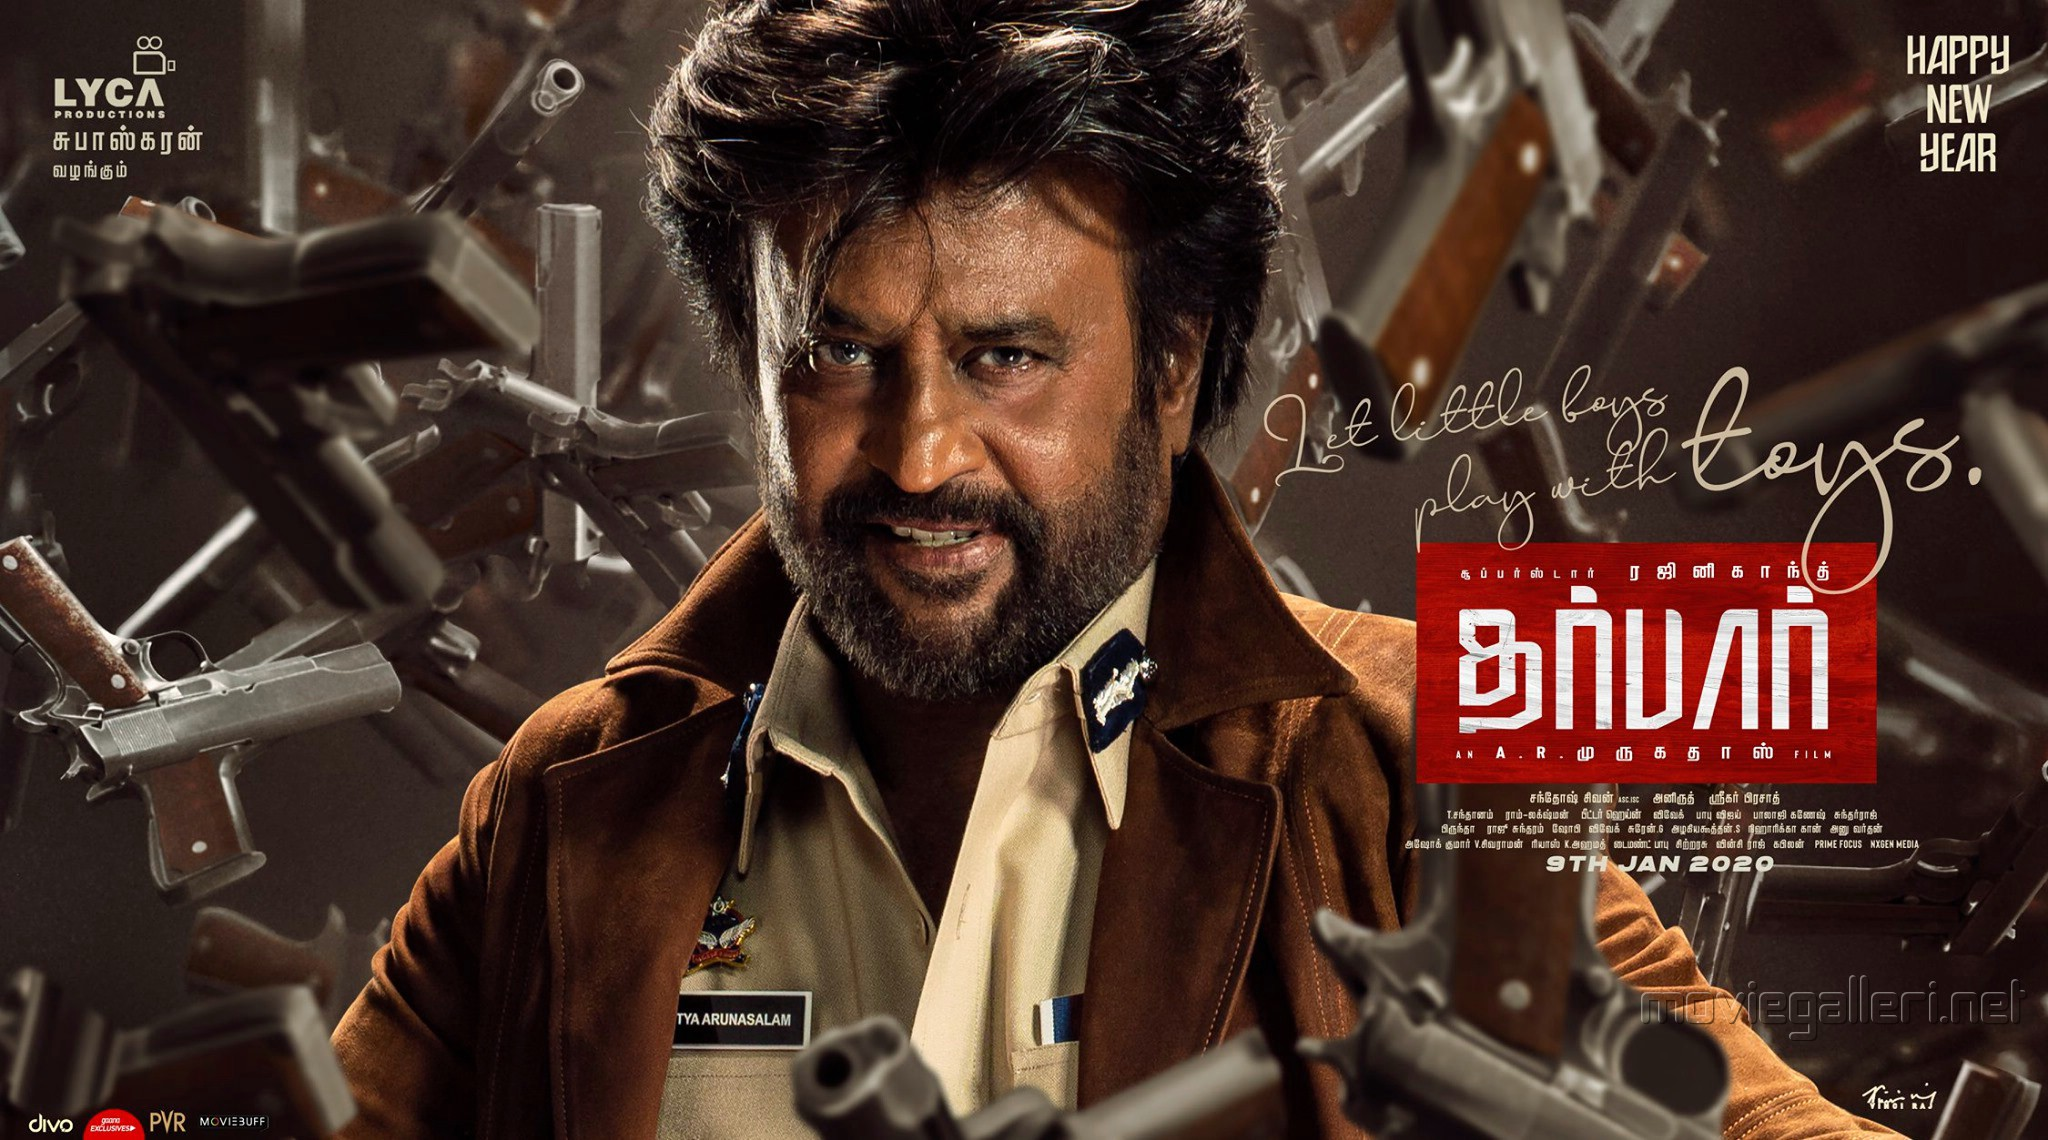 Rajinikanth Darbar Movie New Year 2020 Wishes Posters HD 2d564a2